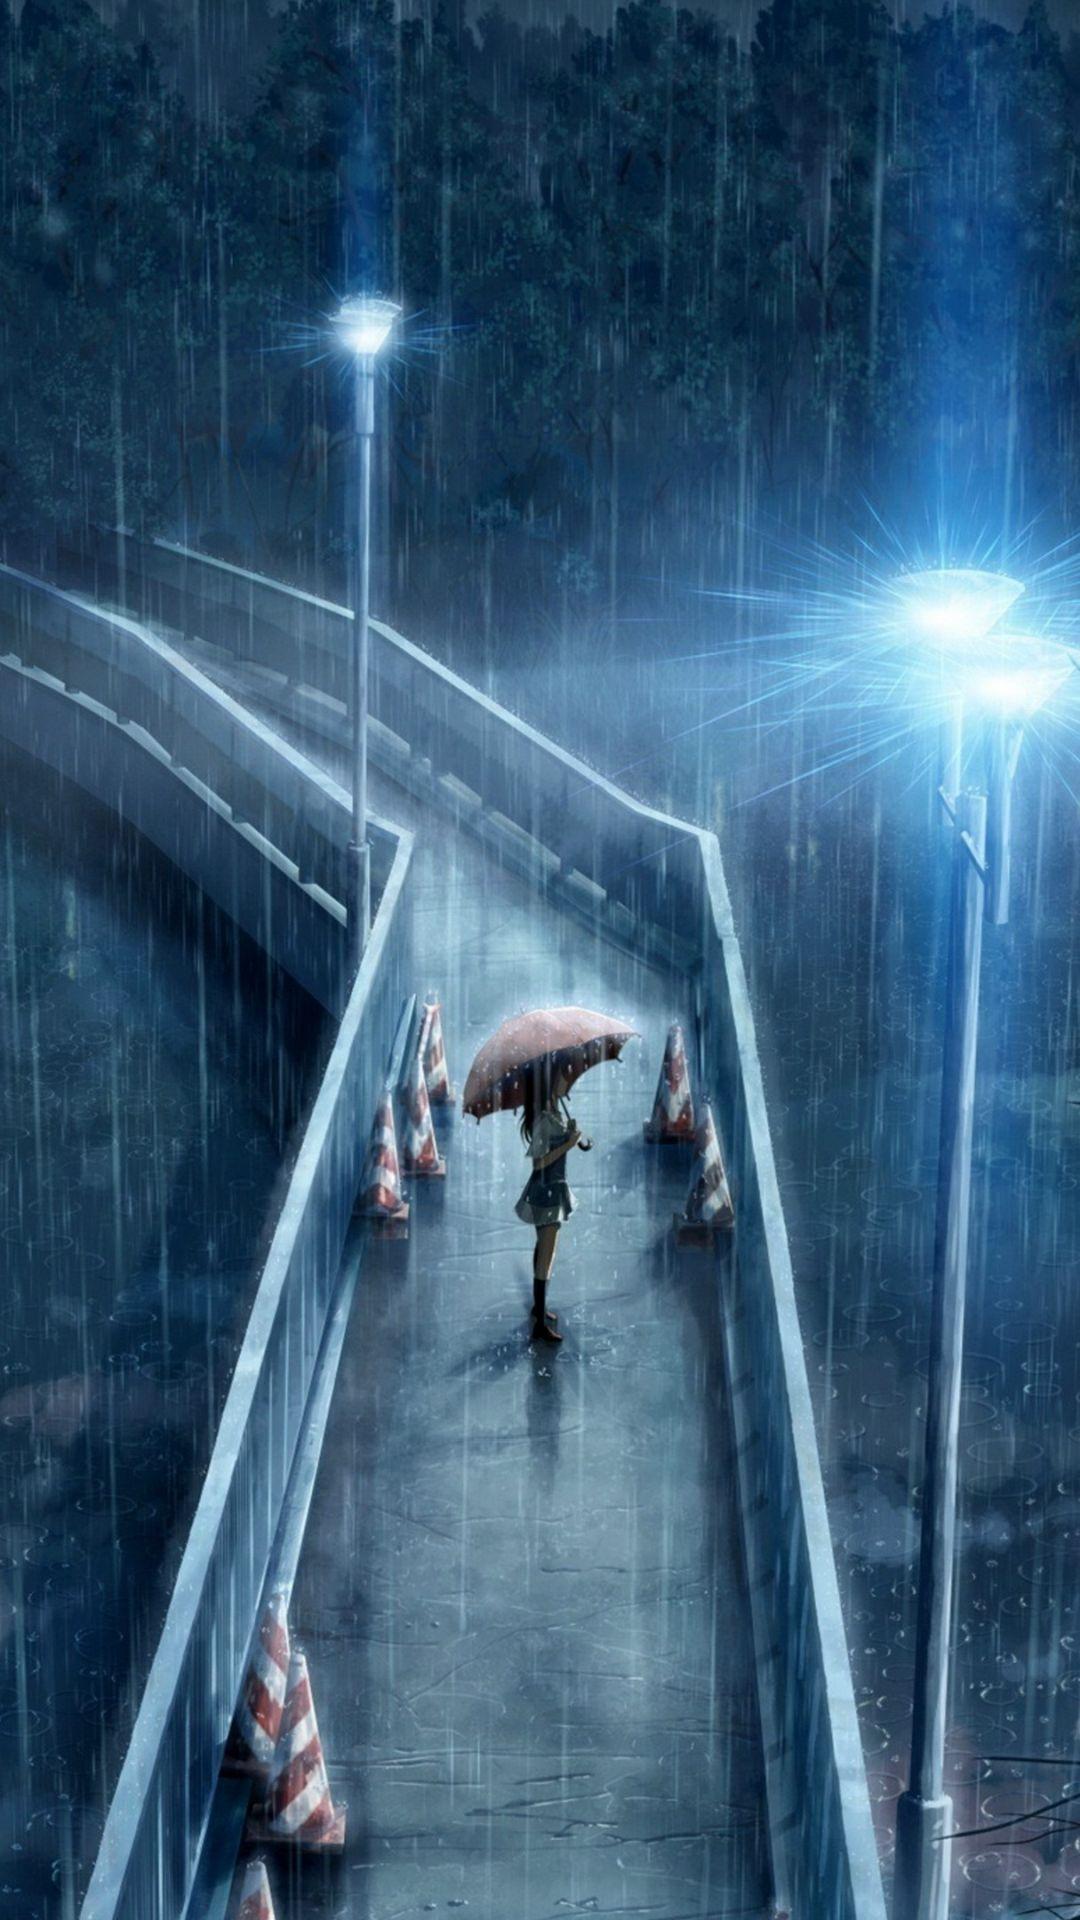 Sad Anime screen saver wallpaper